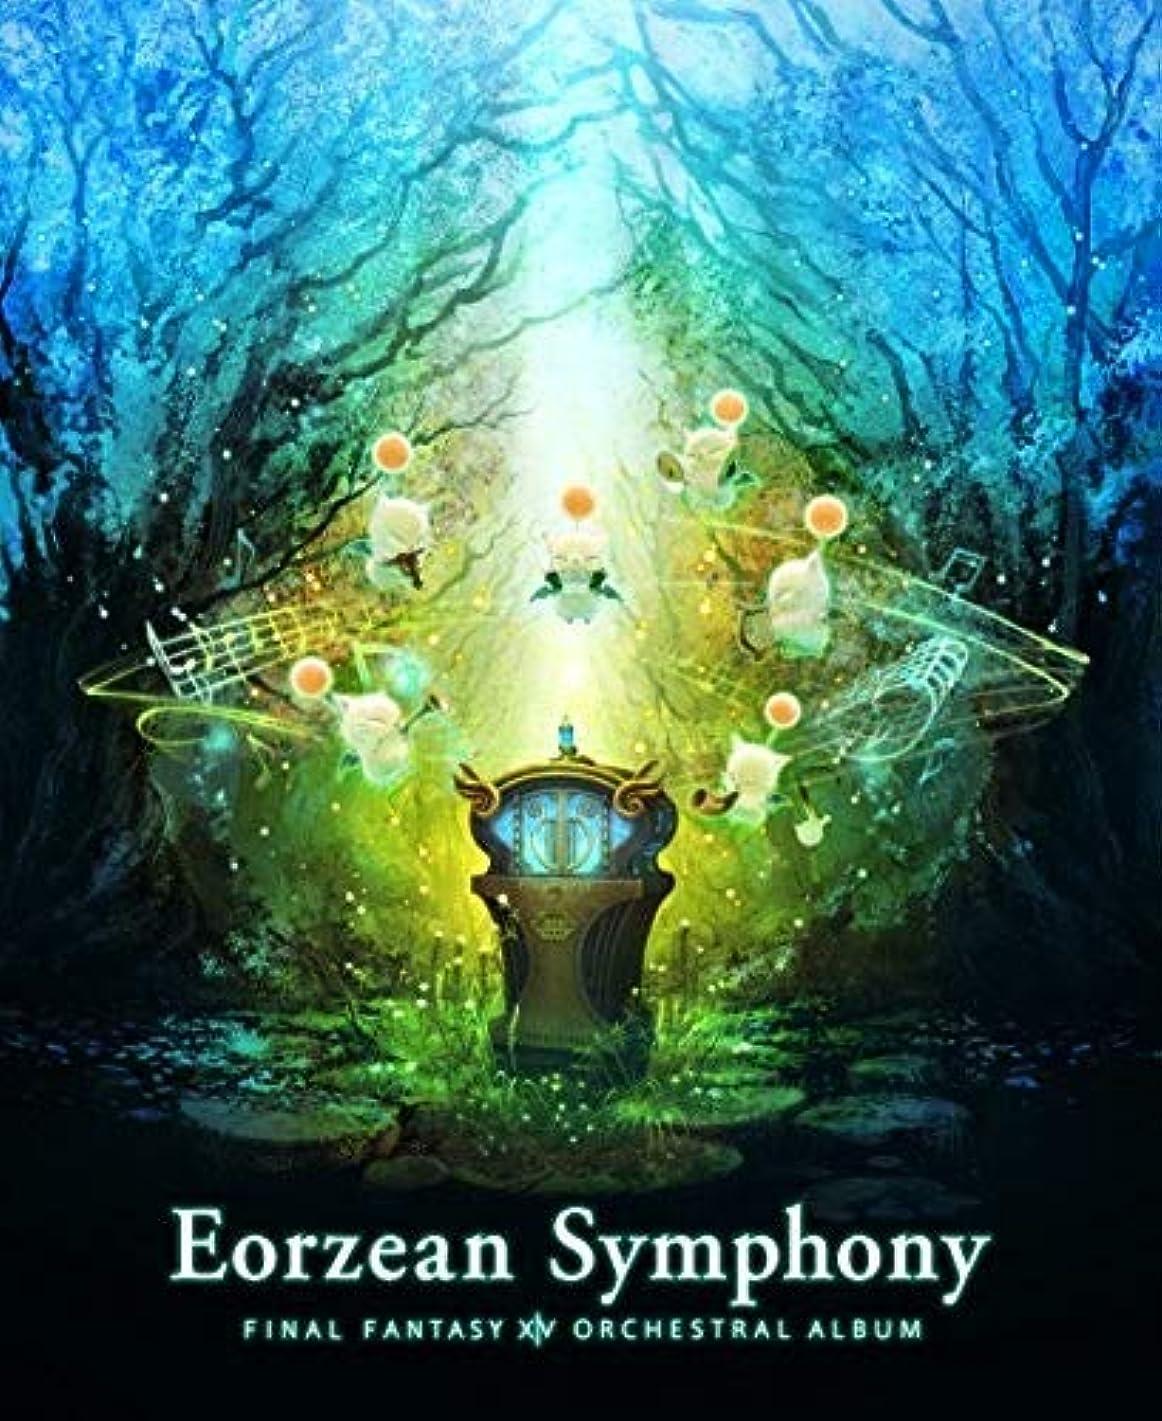 Eorzean Symphony: Final Fantasy XIV (Original Soundtrack)